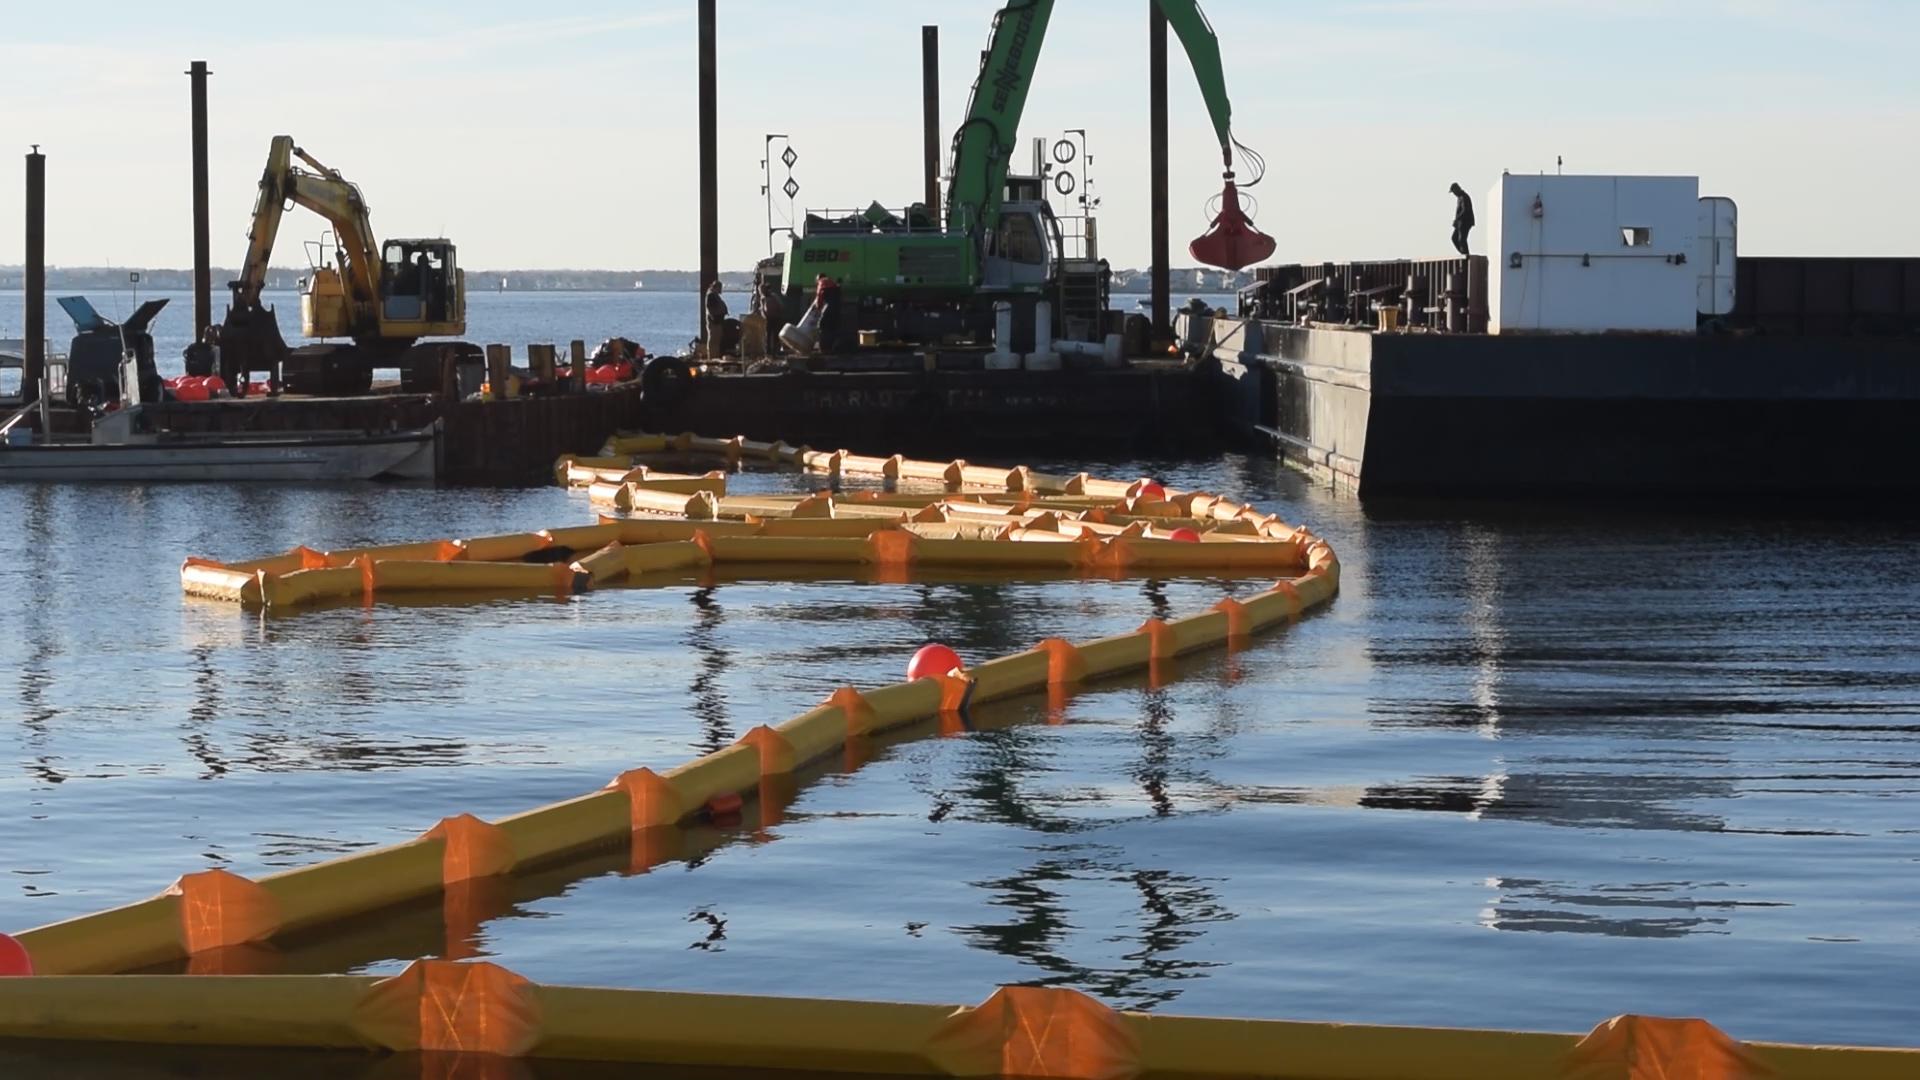 Crews drop off dredge spoils off Bayside Park in Normandy Beach, Brick Township, N.J., Nov. 4, 2018. (Photo: Daniel Nee)